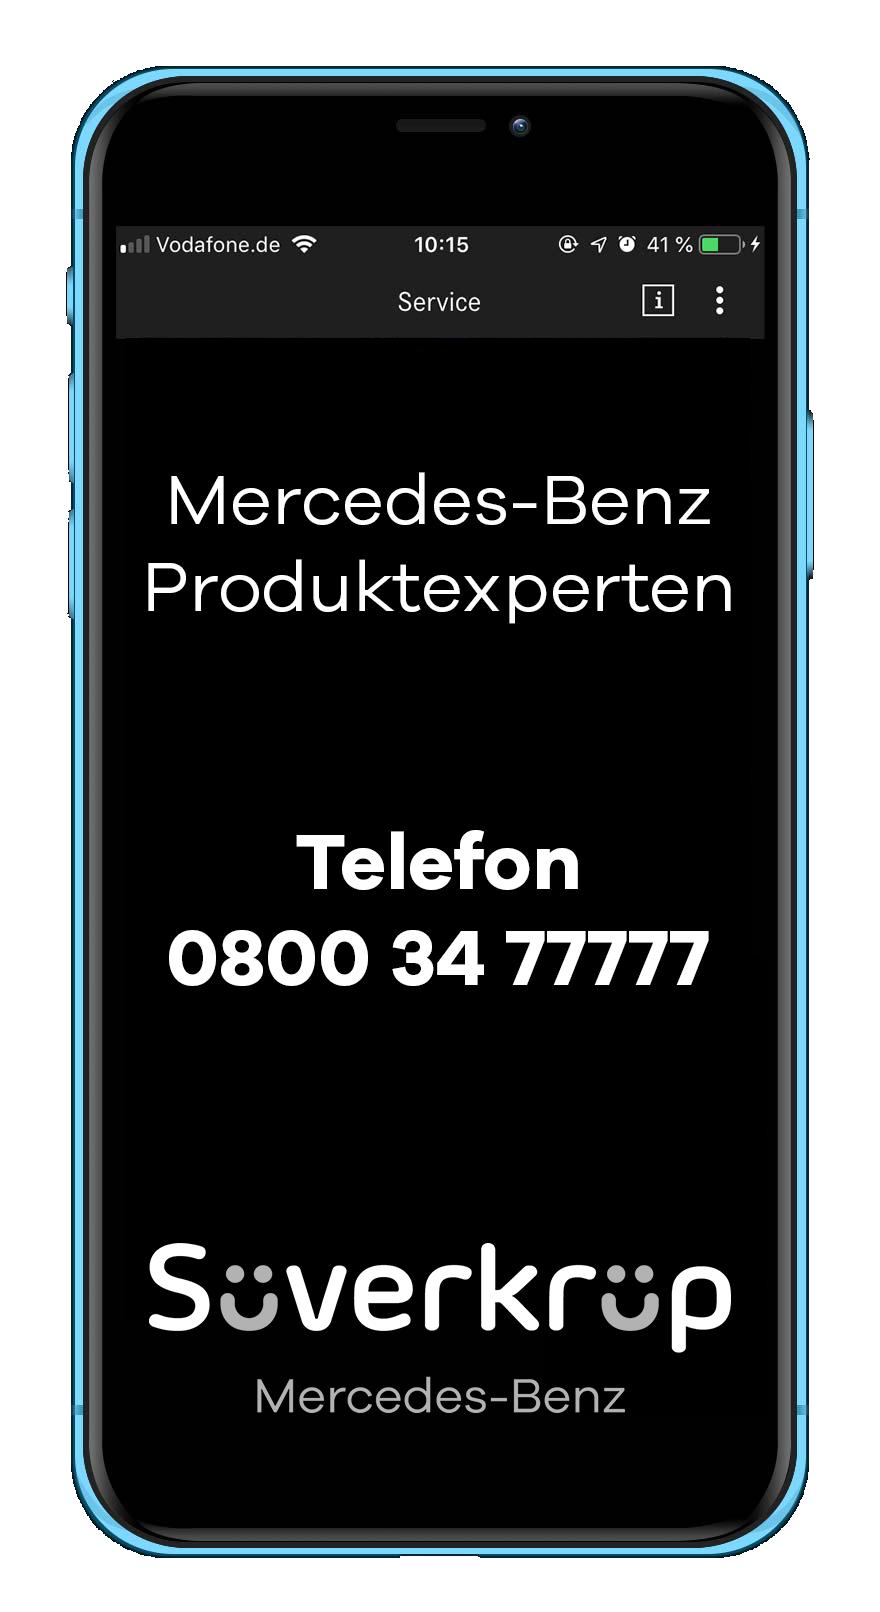 Kontakt Mercedes-Benz Produktexperte